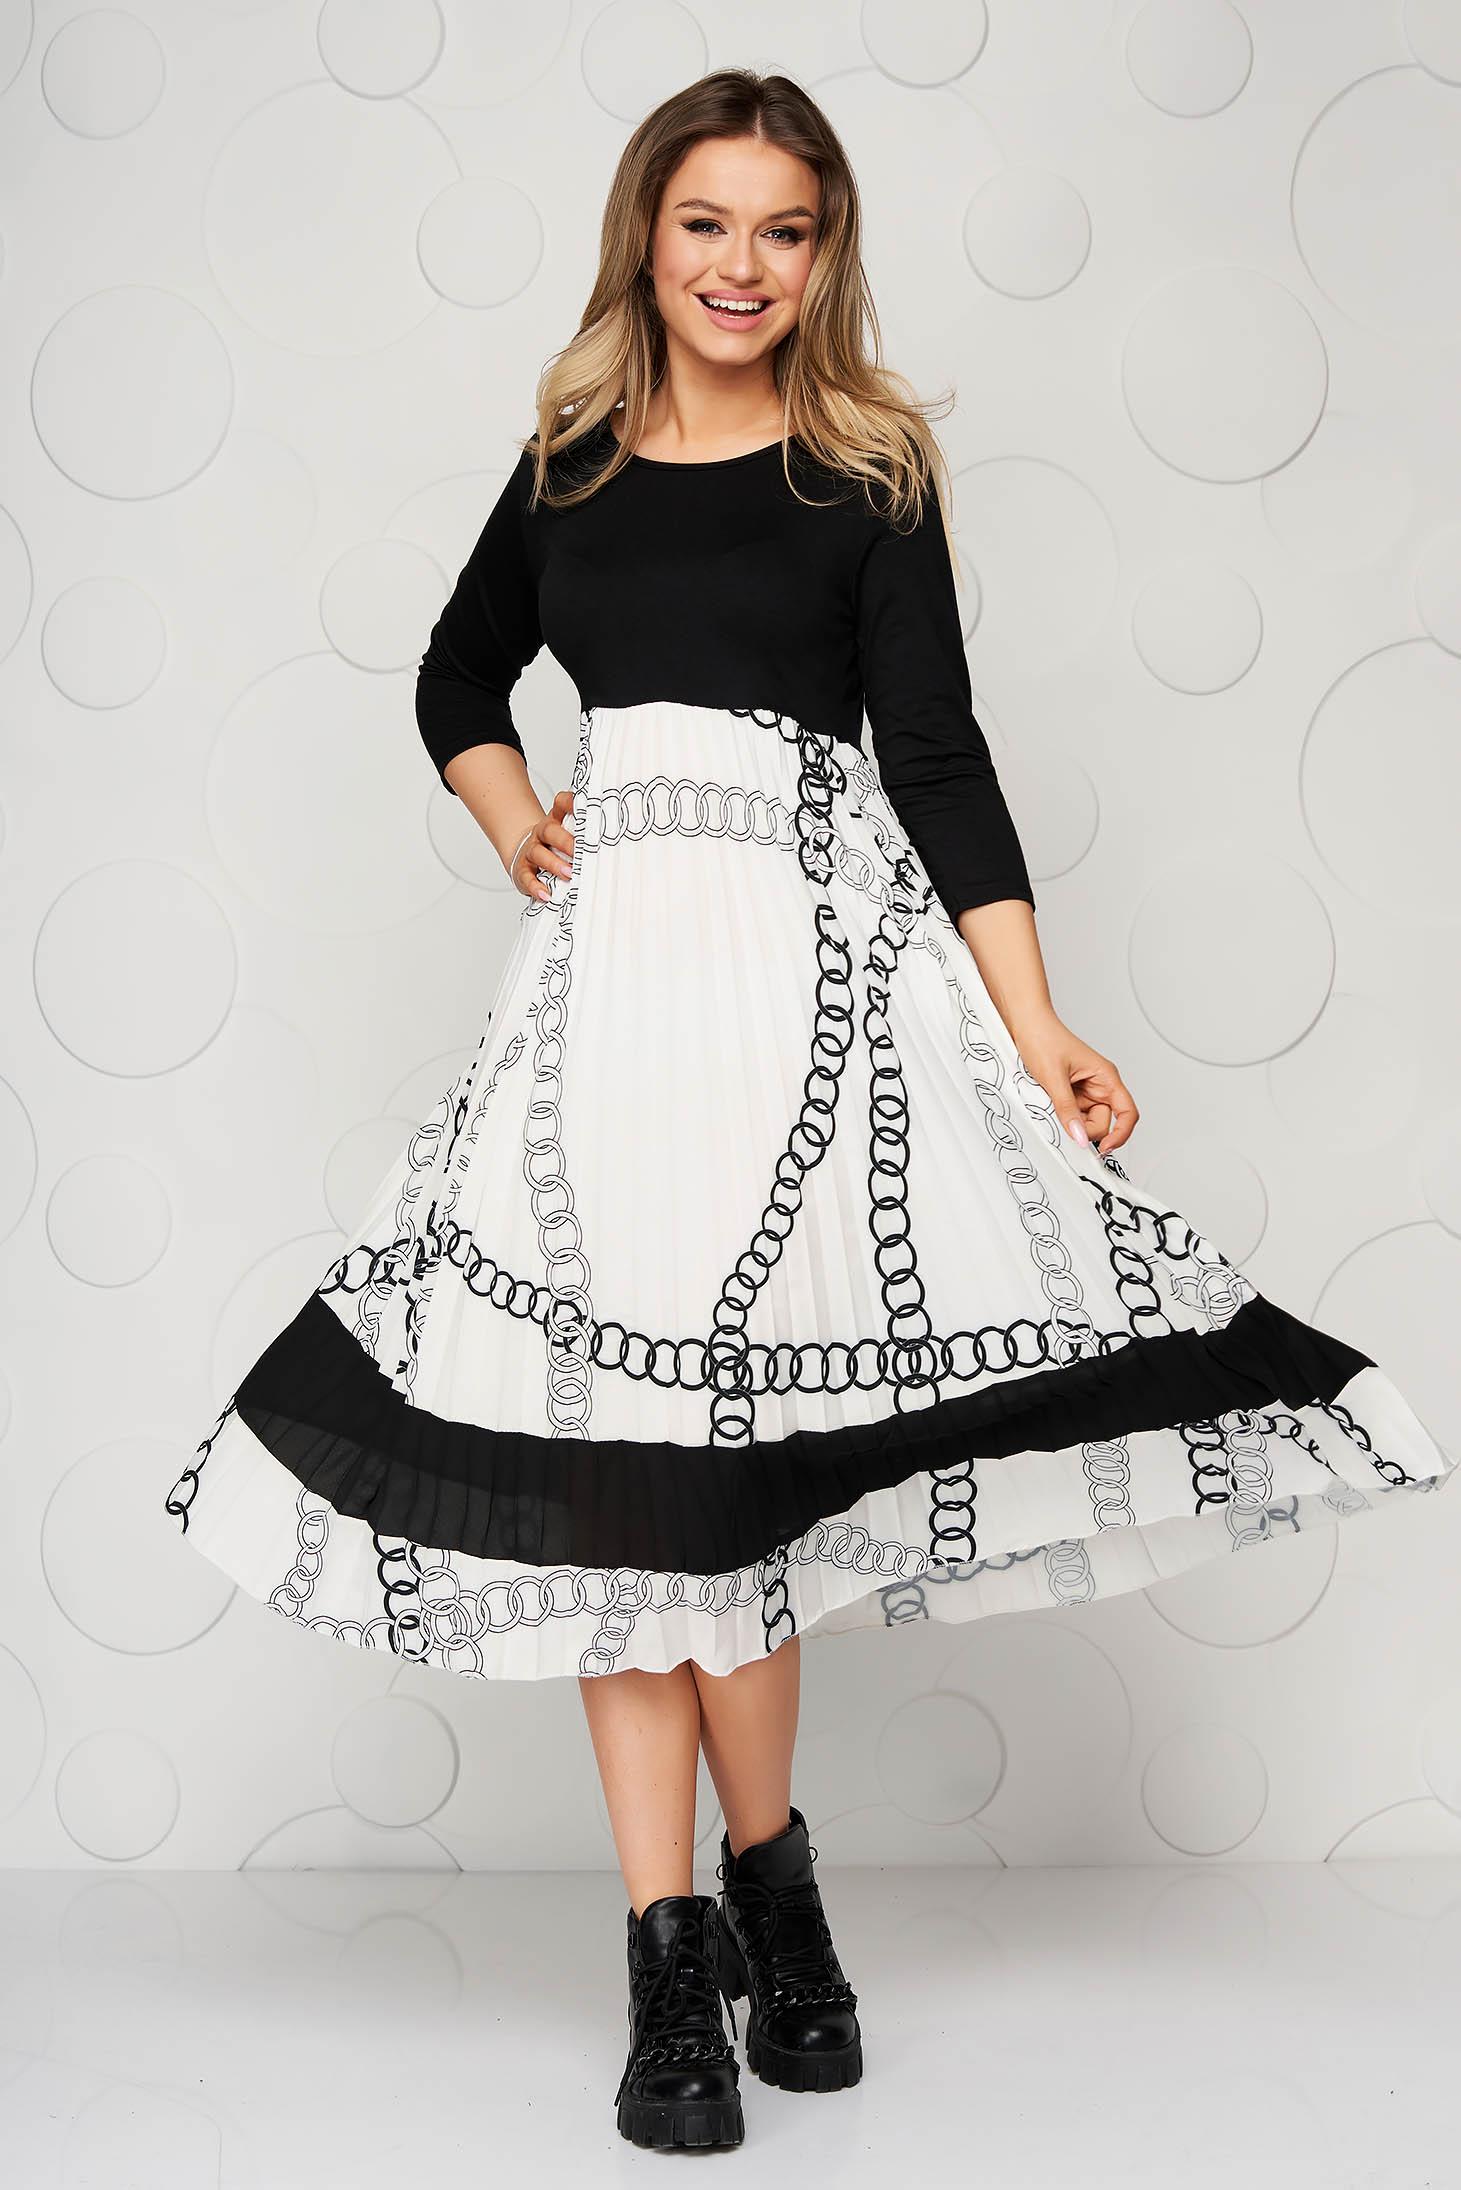 Black dress folded up soft fabric thin fabric midi